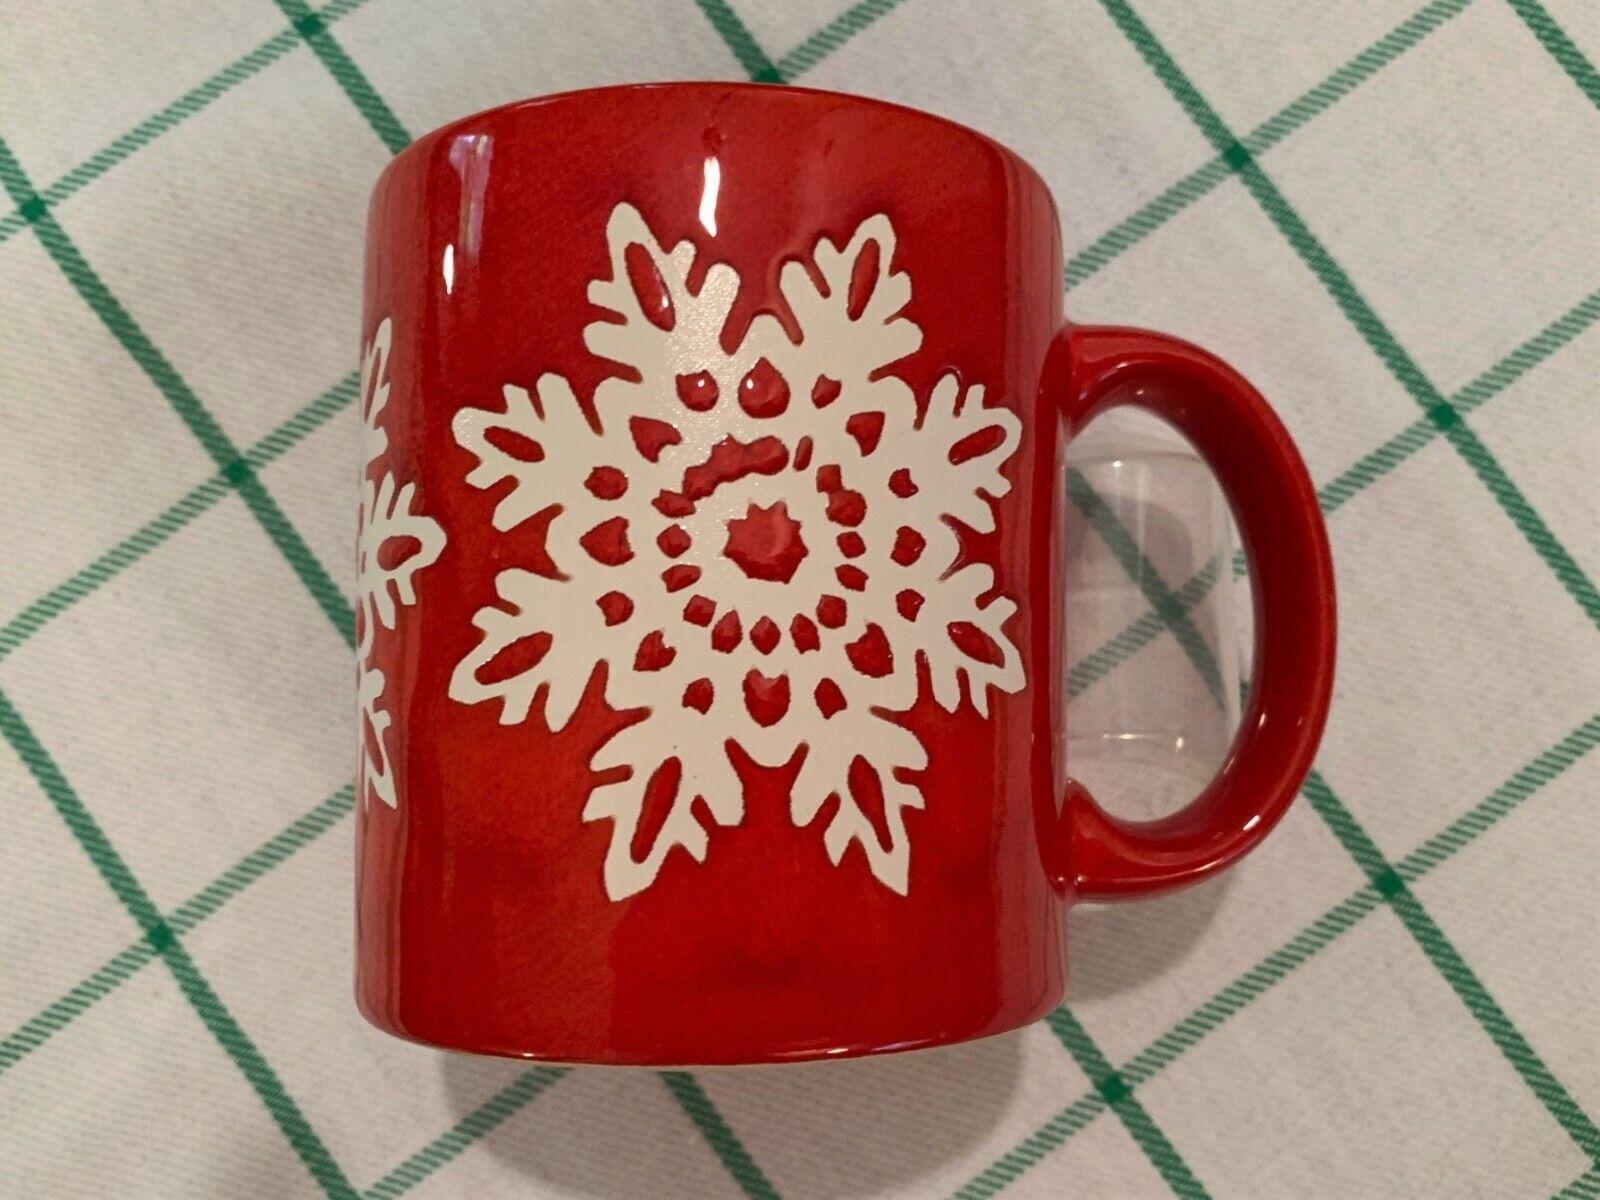 Waechtersbach Red Christmas Coffee Mug  w/ White Snowflakes